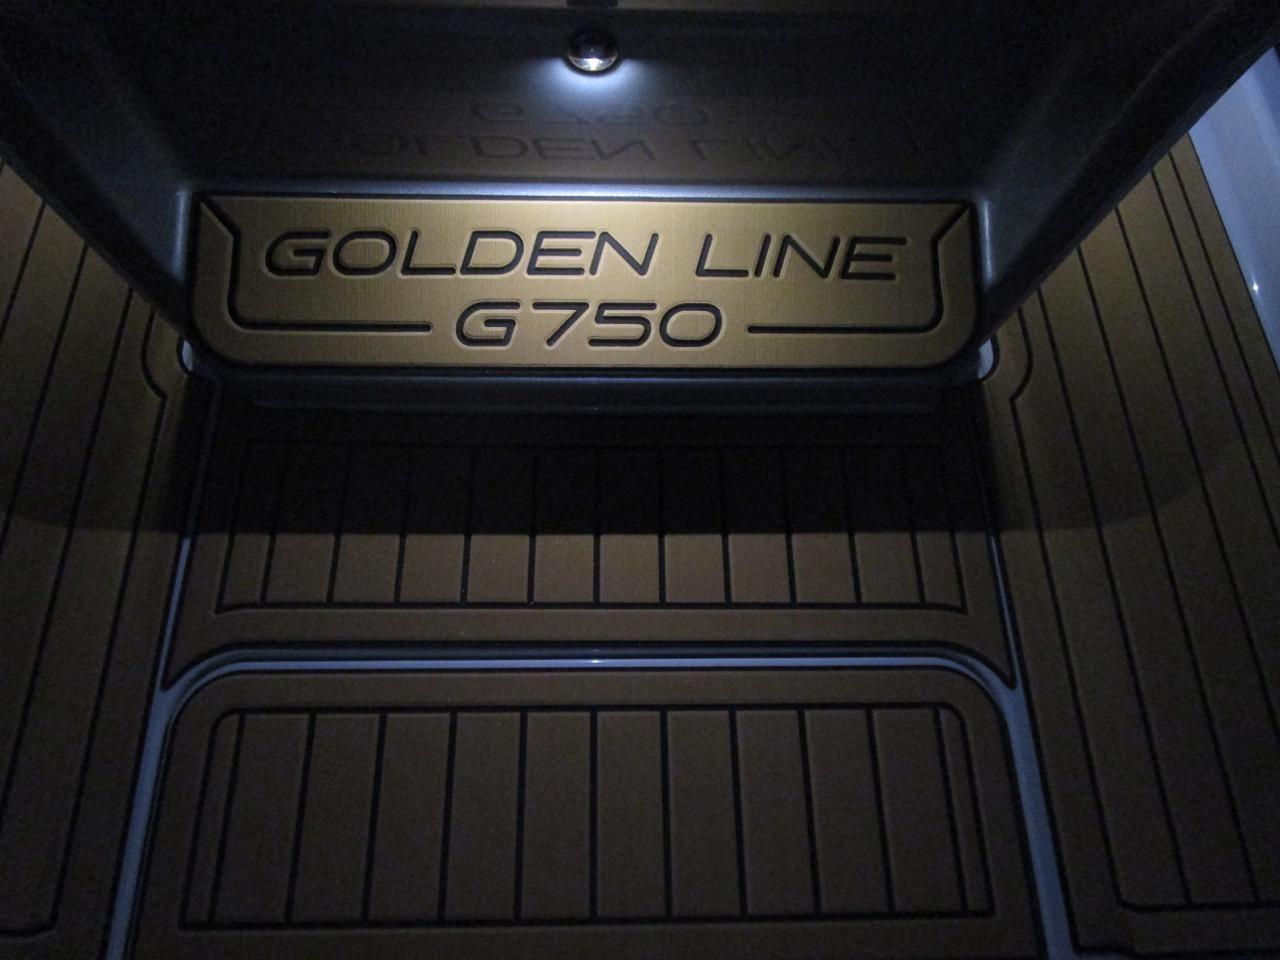 GRAND G750 RIB LED deck lights, helm position deck lights